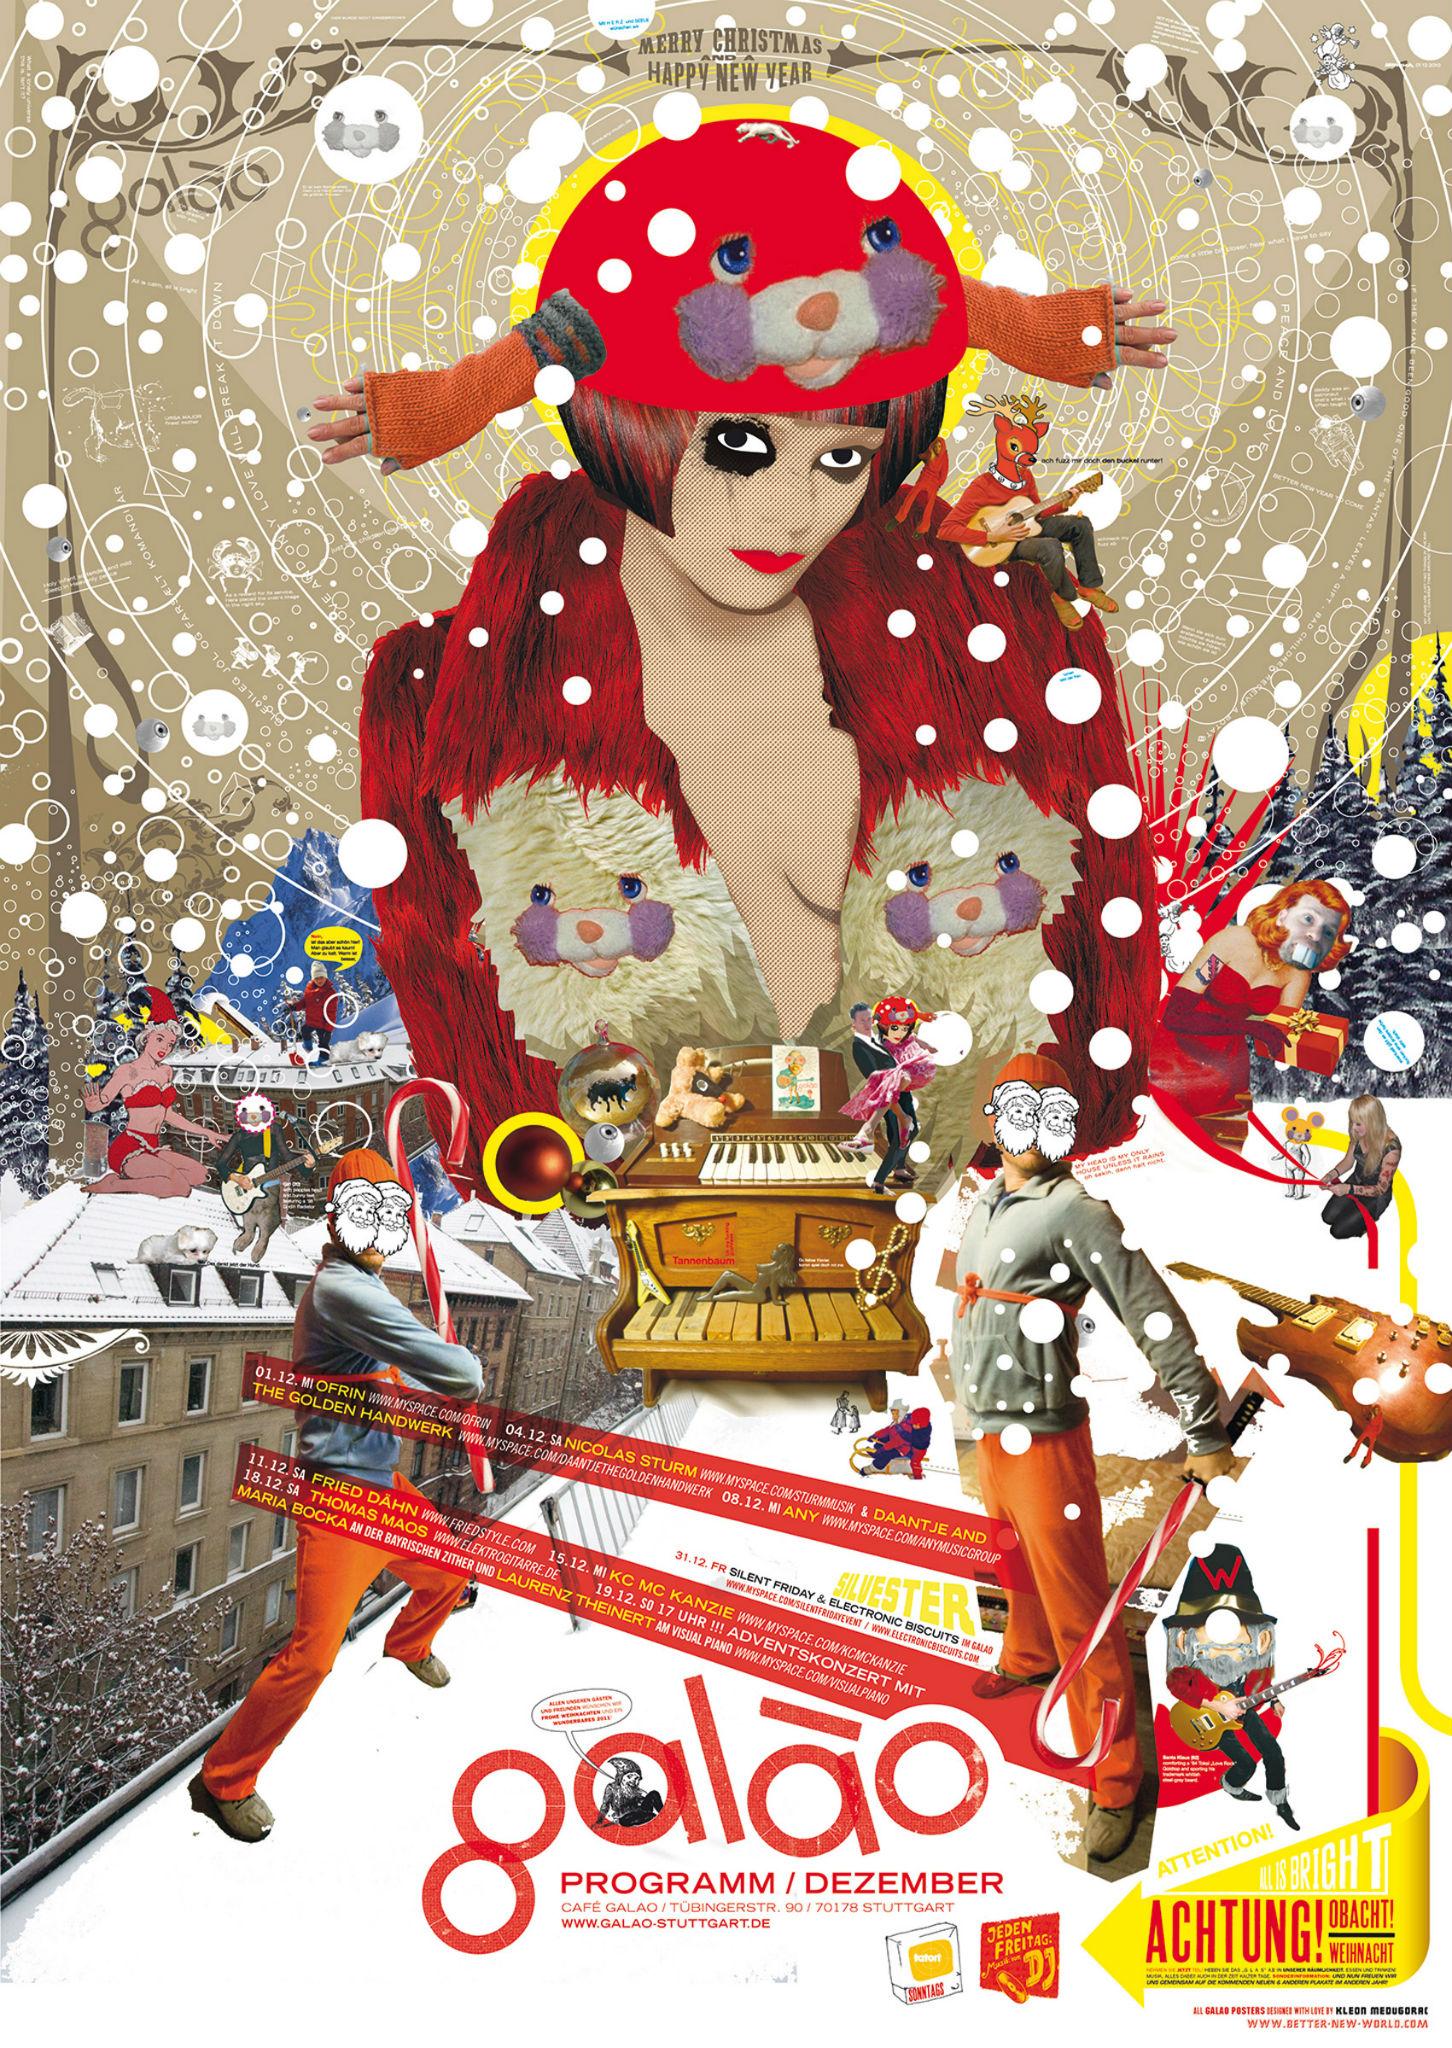 Kleon Medugorac Café Galao Christmas Poster